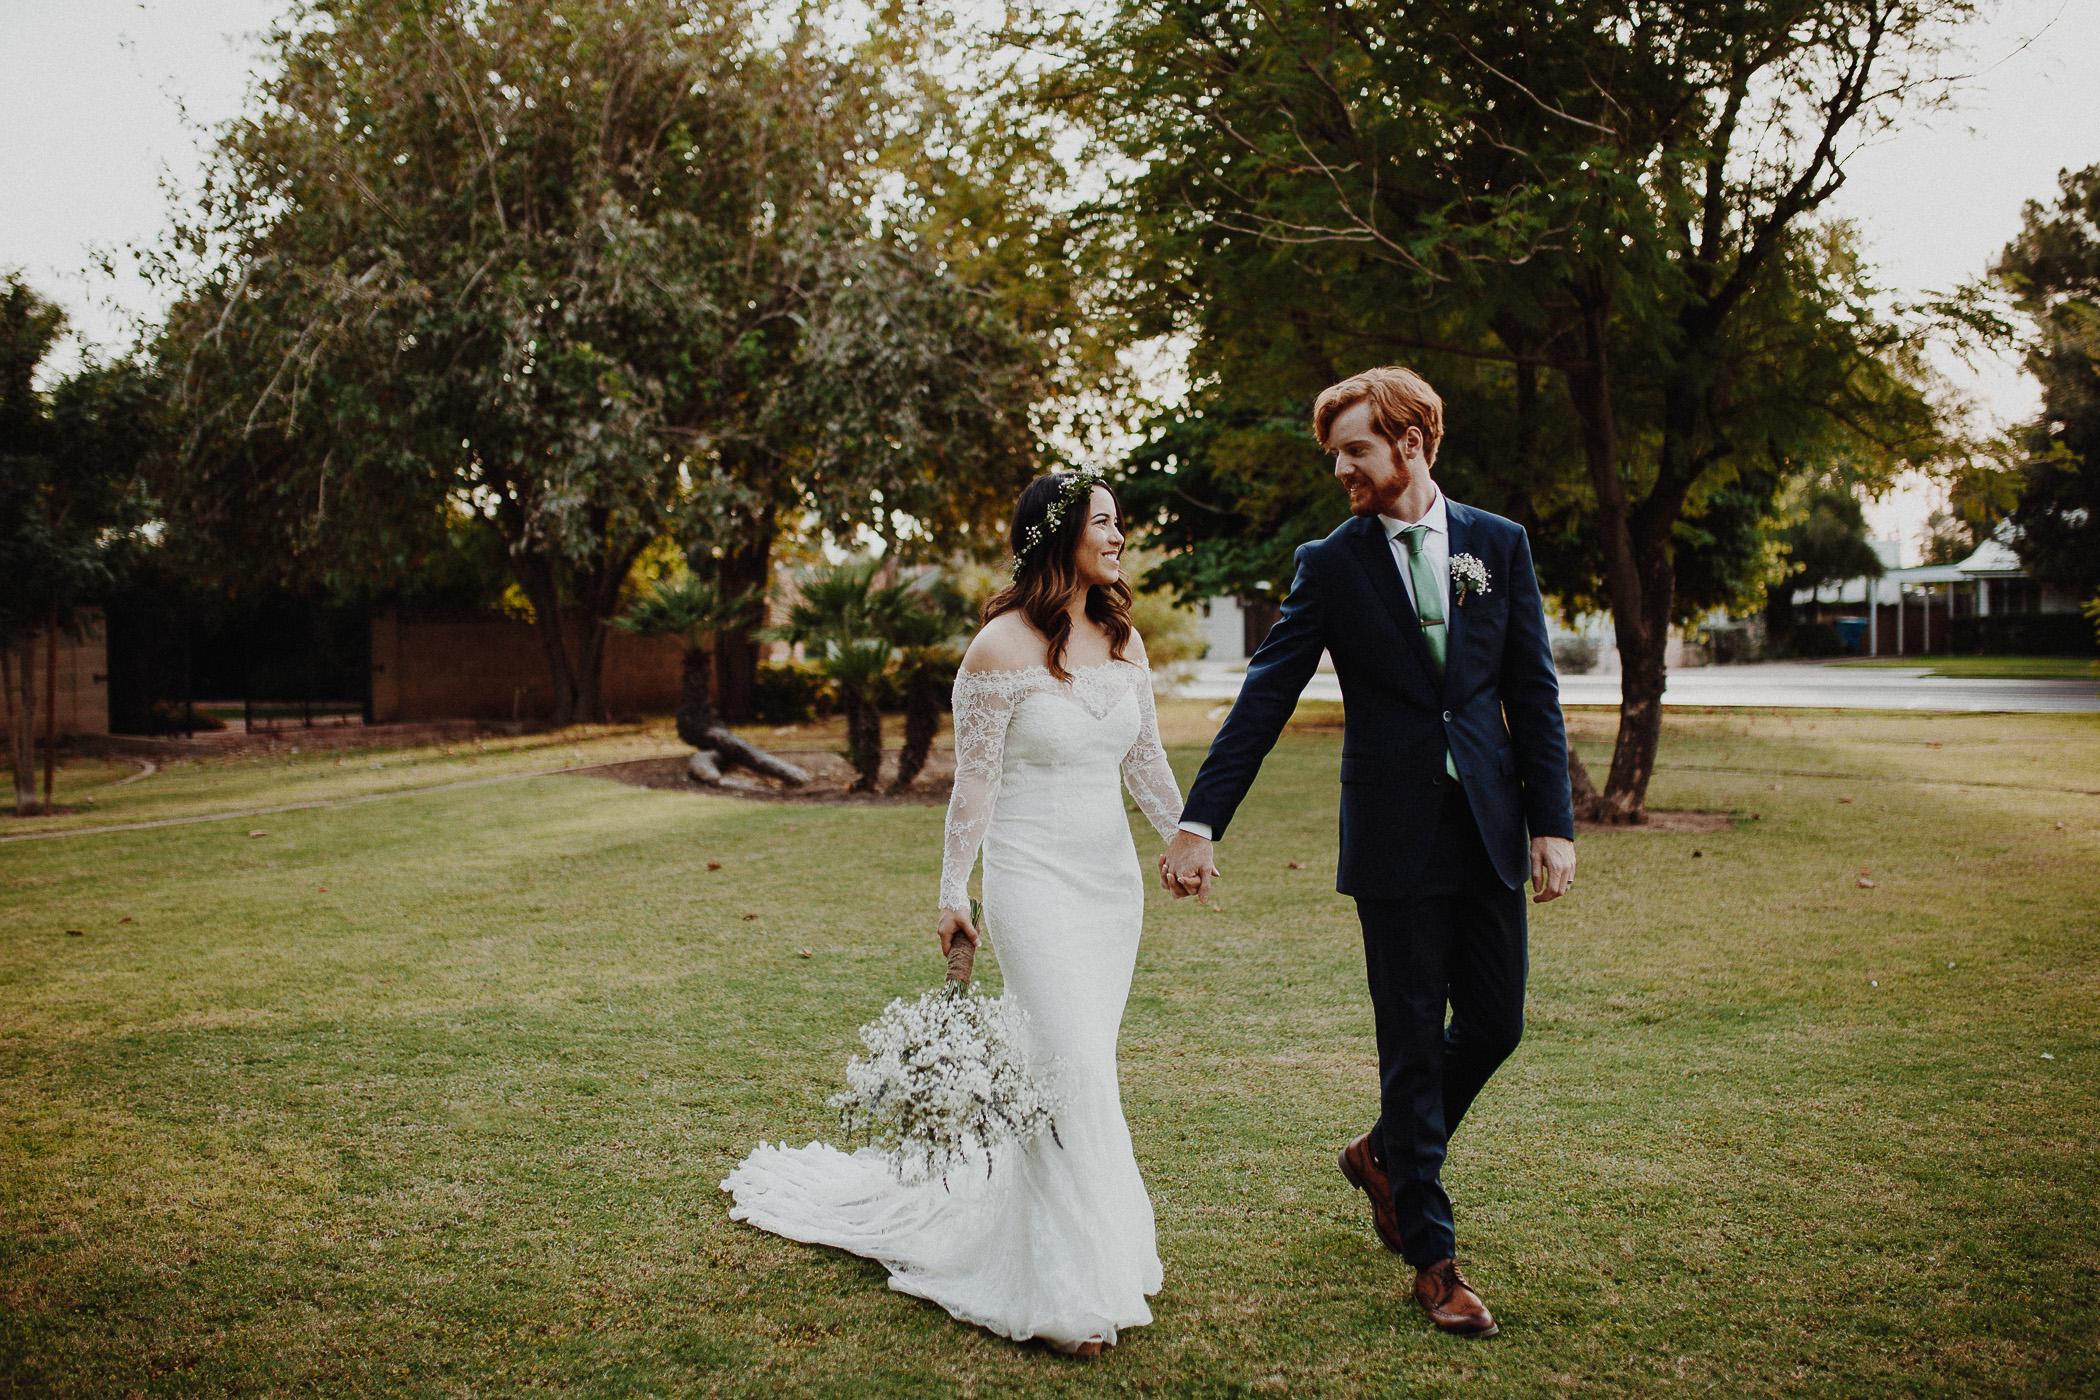 181104-Luxium-Weddings-Arizona-@matt__Le-Brandon-Kariana-Phoenix-Valley-Garden-Center-1104.jpg